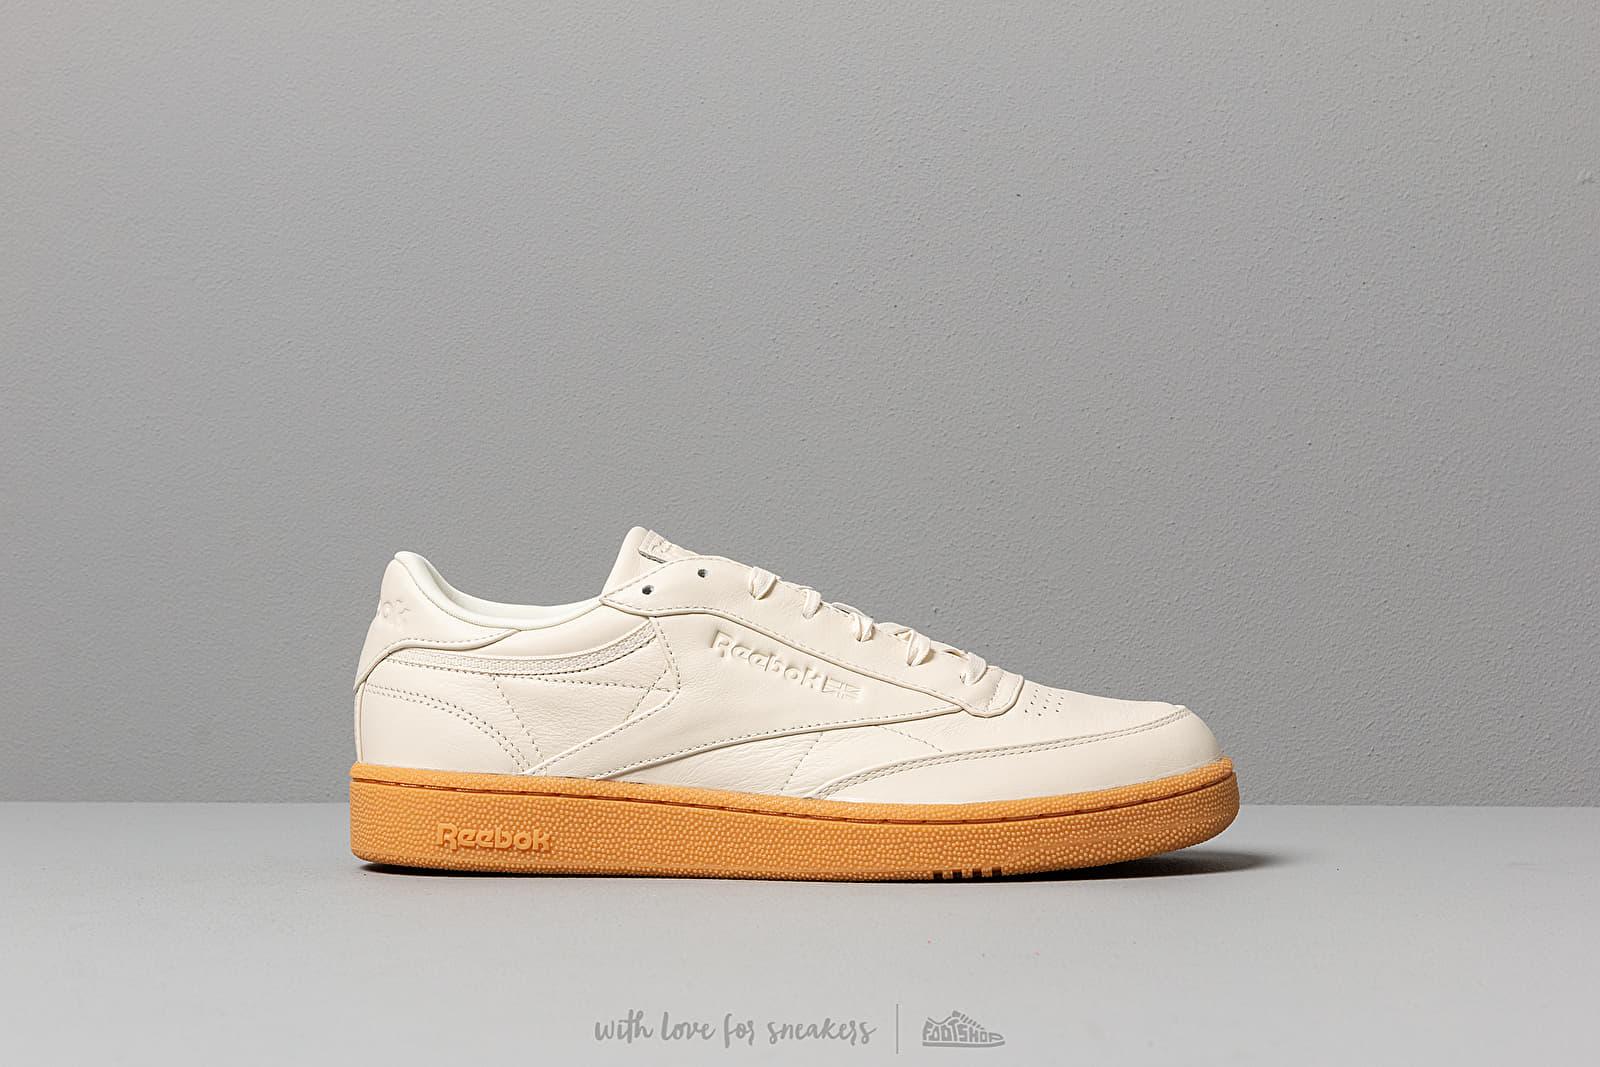 b75afac125 Reebok Club C 85 MU Classic White/ Gum | Footshop